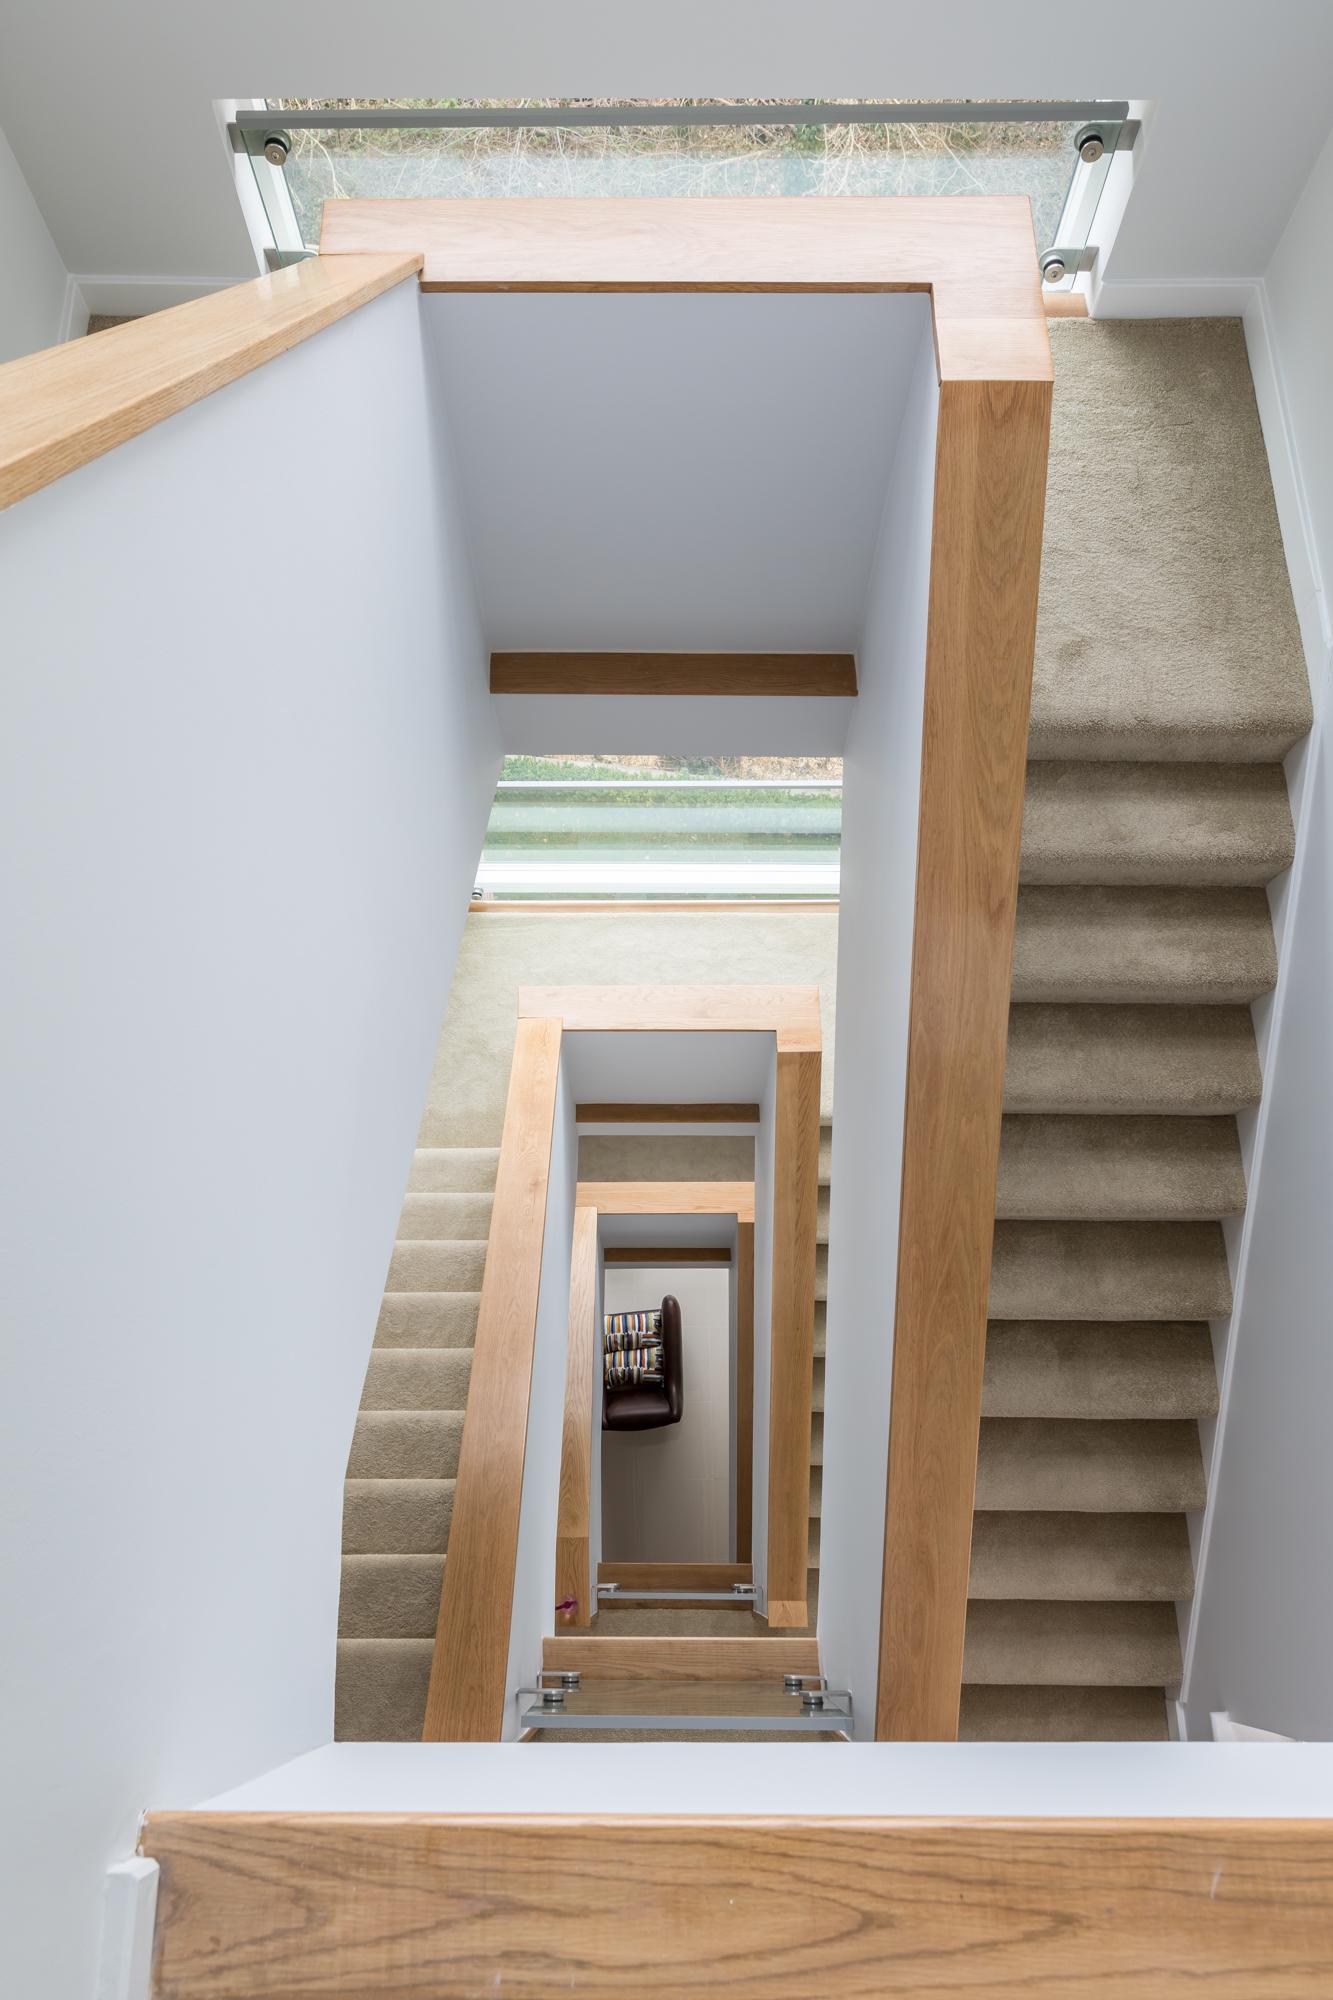 jonathan bond photography, sara slade interiors, modern banisters, cambridgeshire